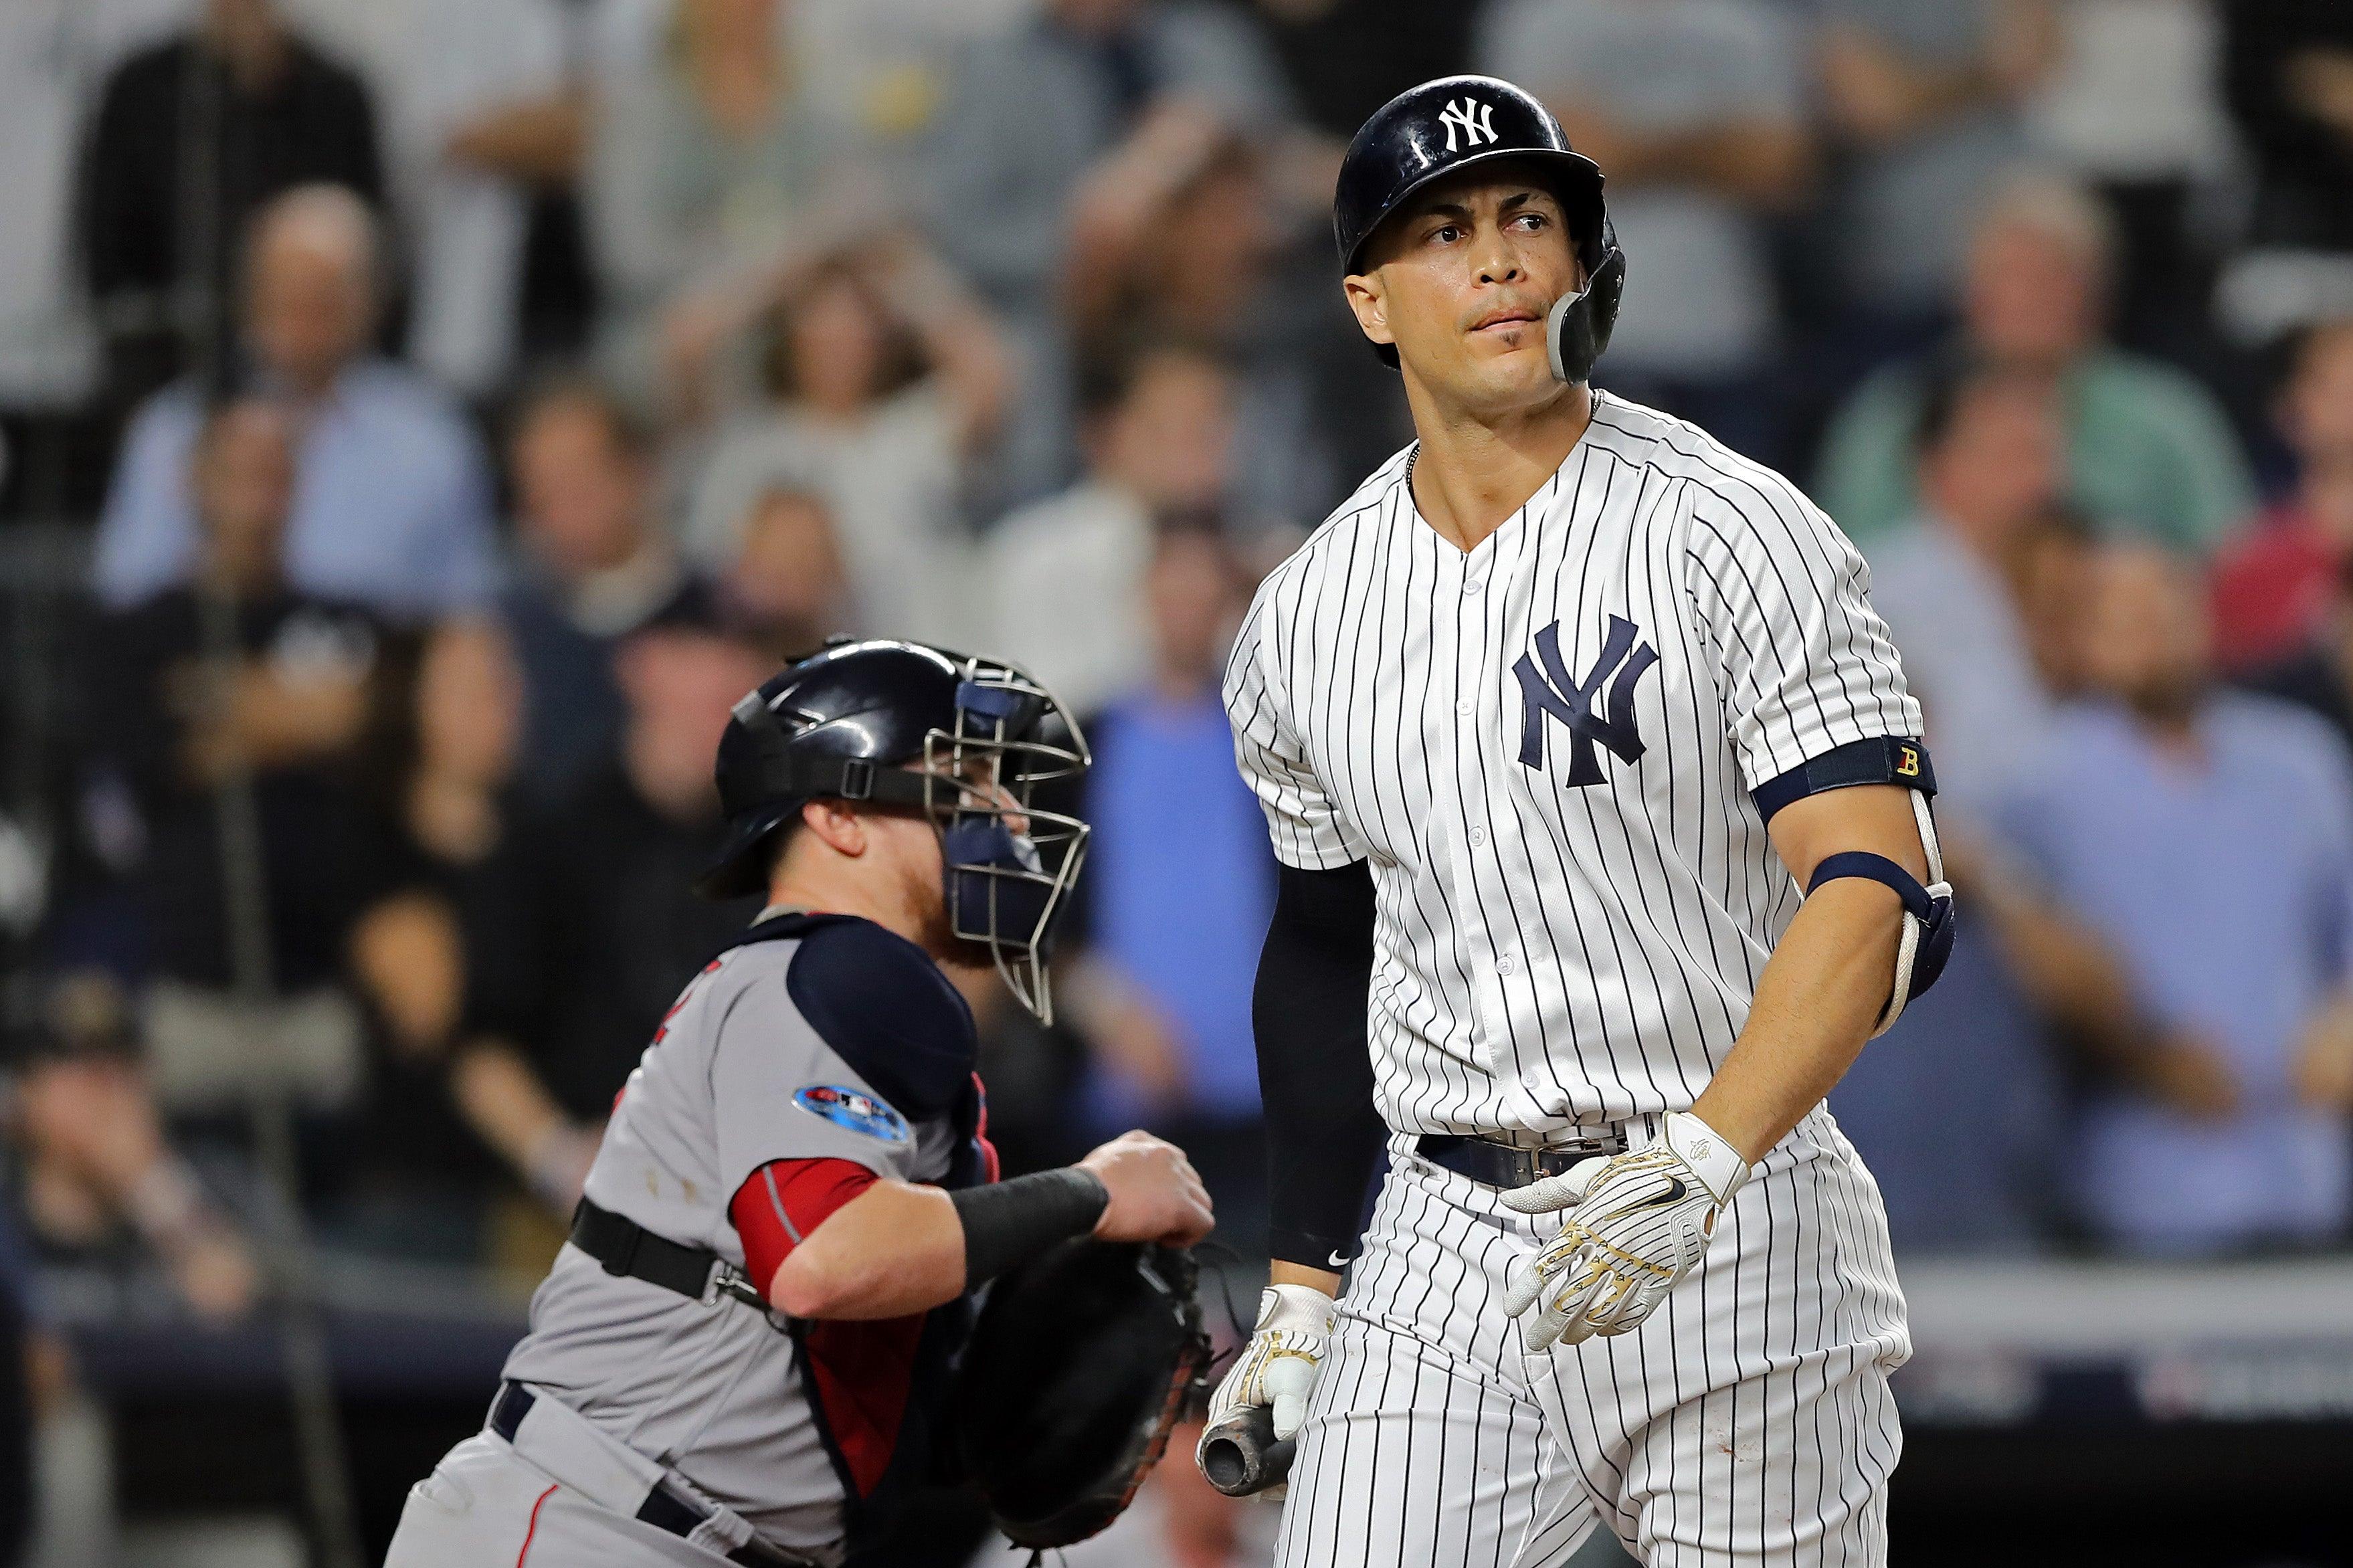 Giancarlo Stanton Yankees ALDS strikeout